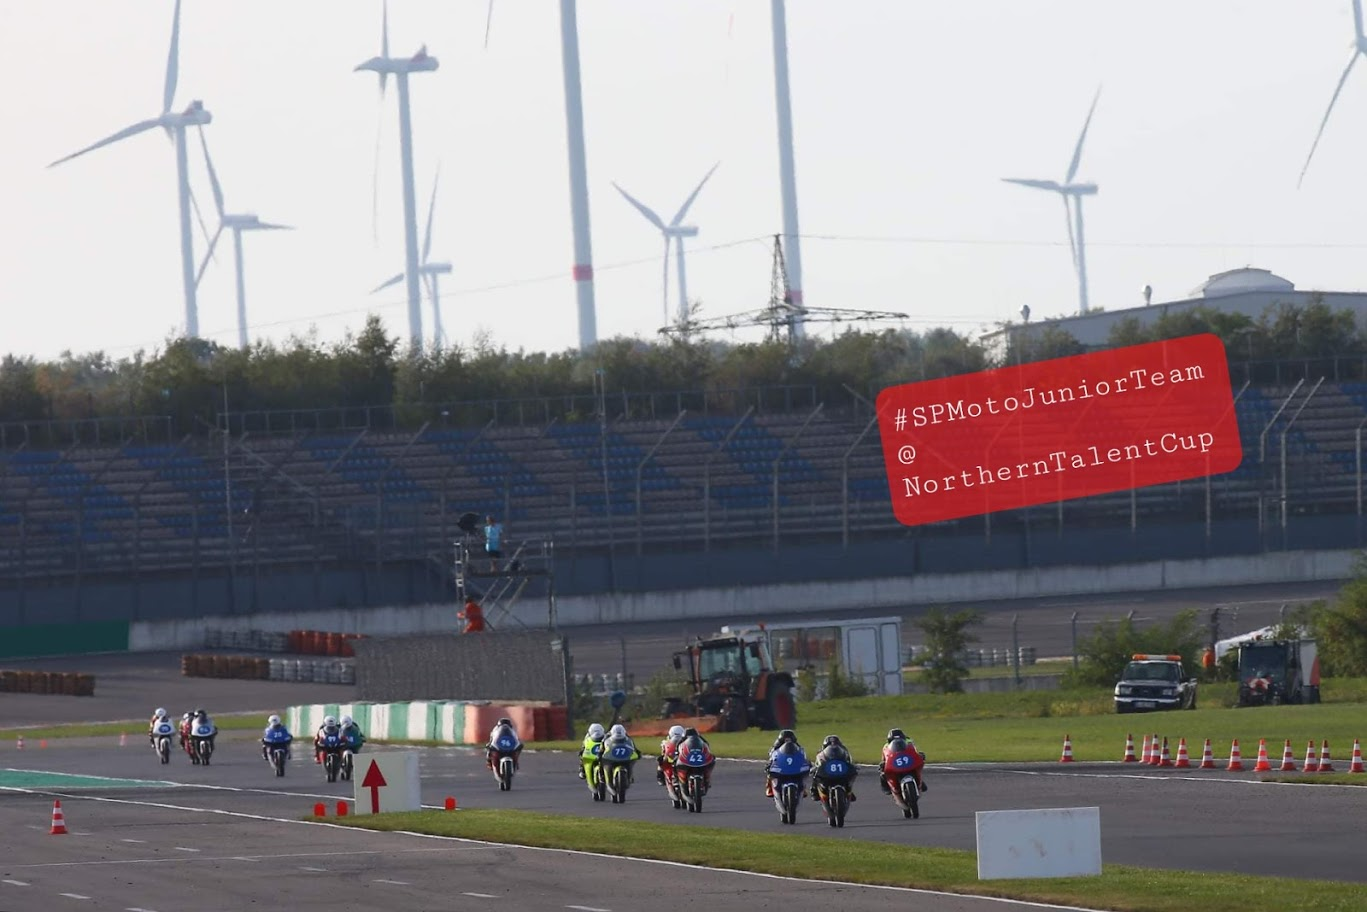 SPMotoJuniorTeam @ NorthernTalentCup. Lausitzring. Race2. Timur Kostin #17, Max Kovalev #3. 1/ 8